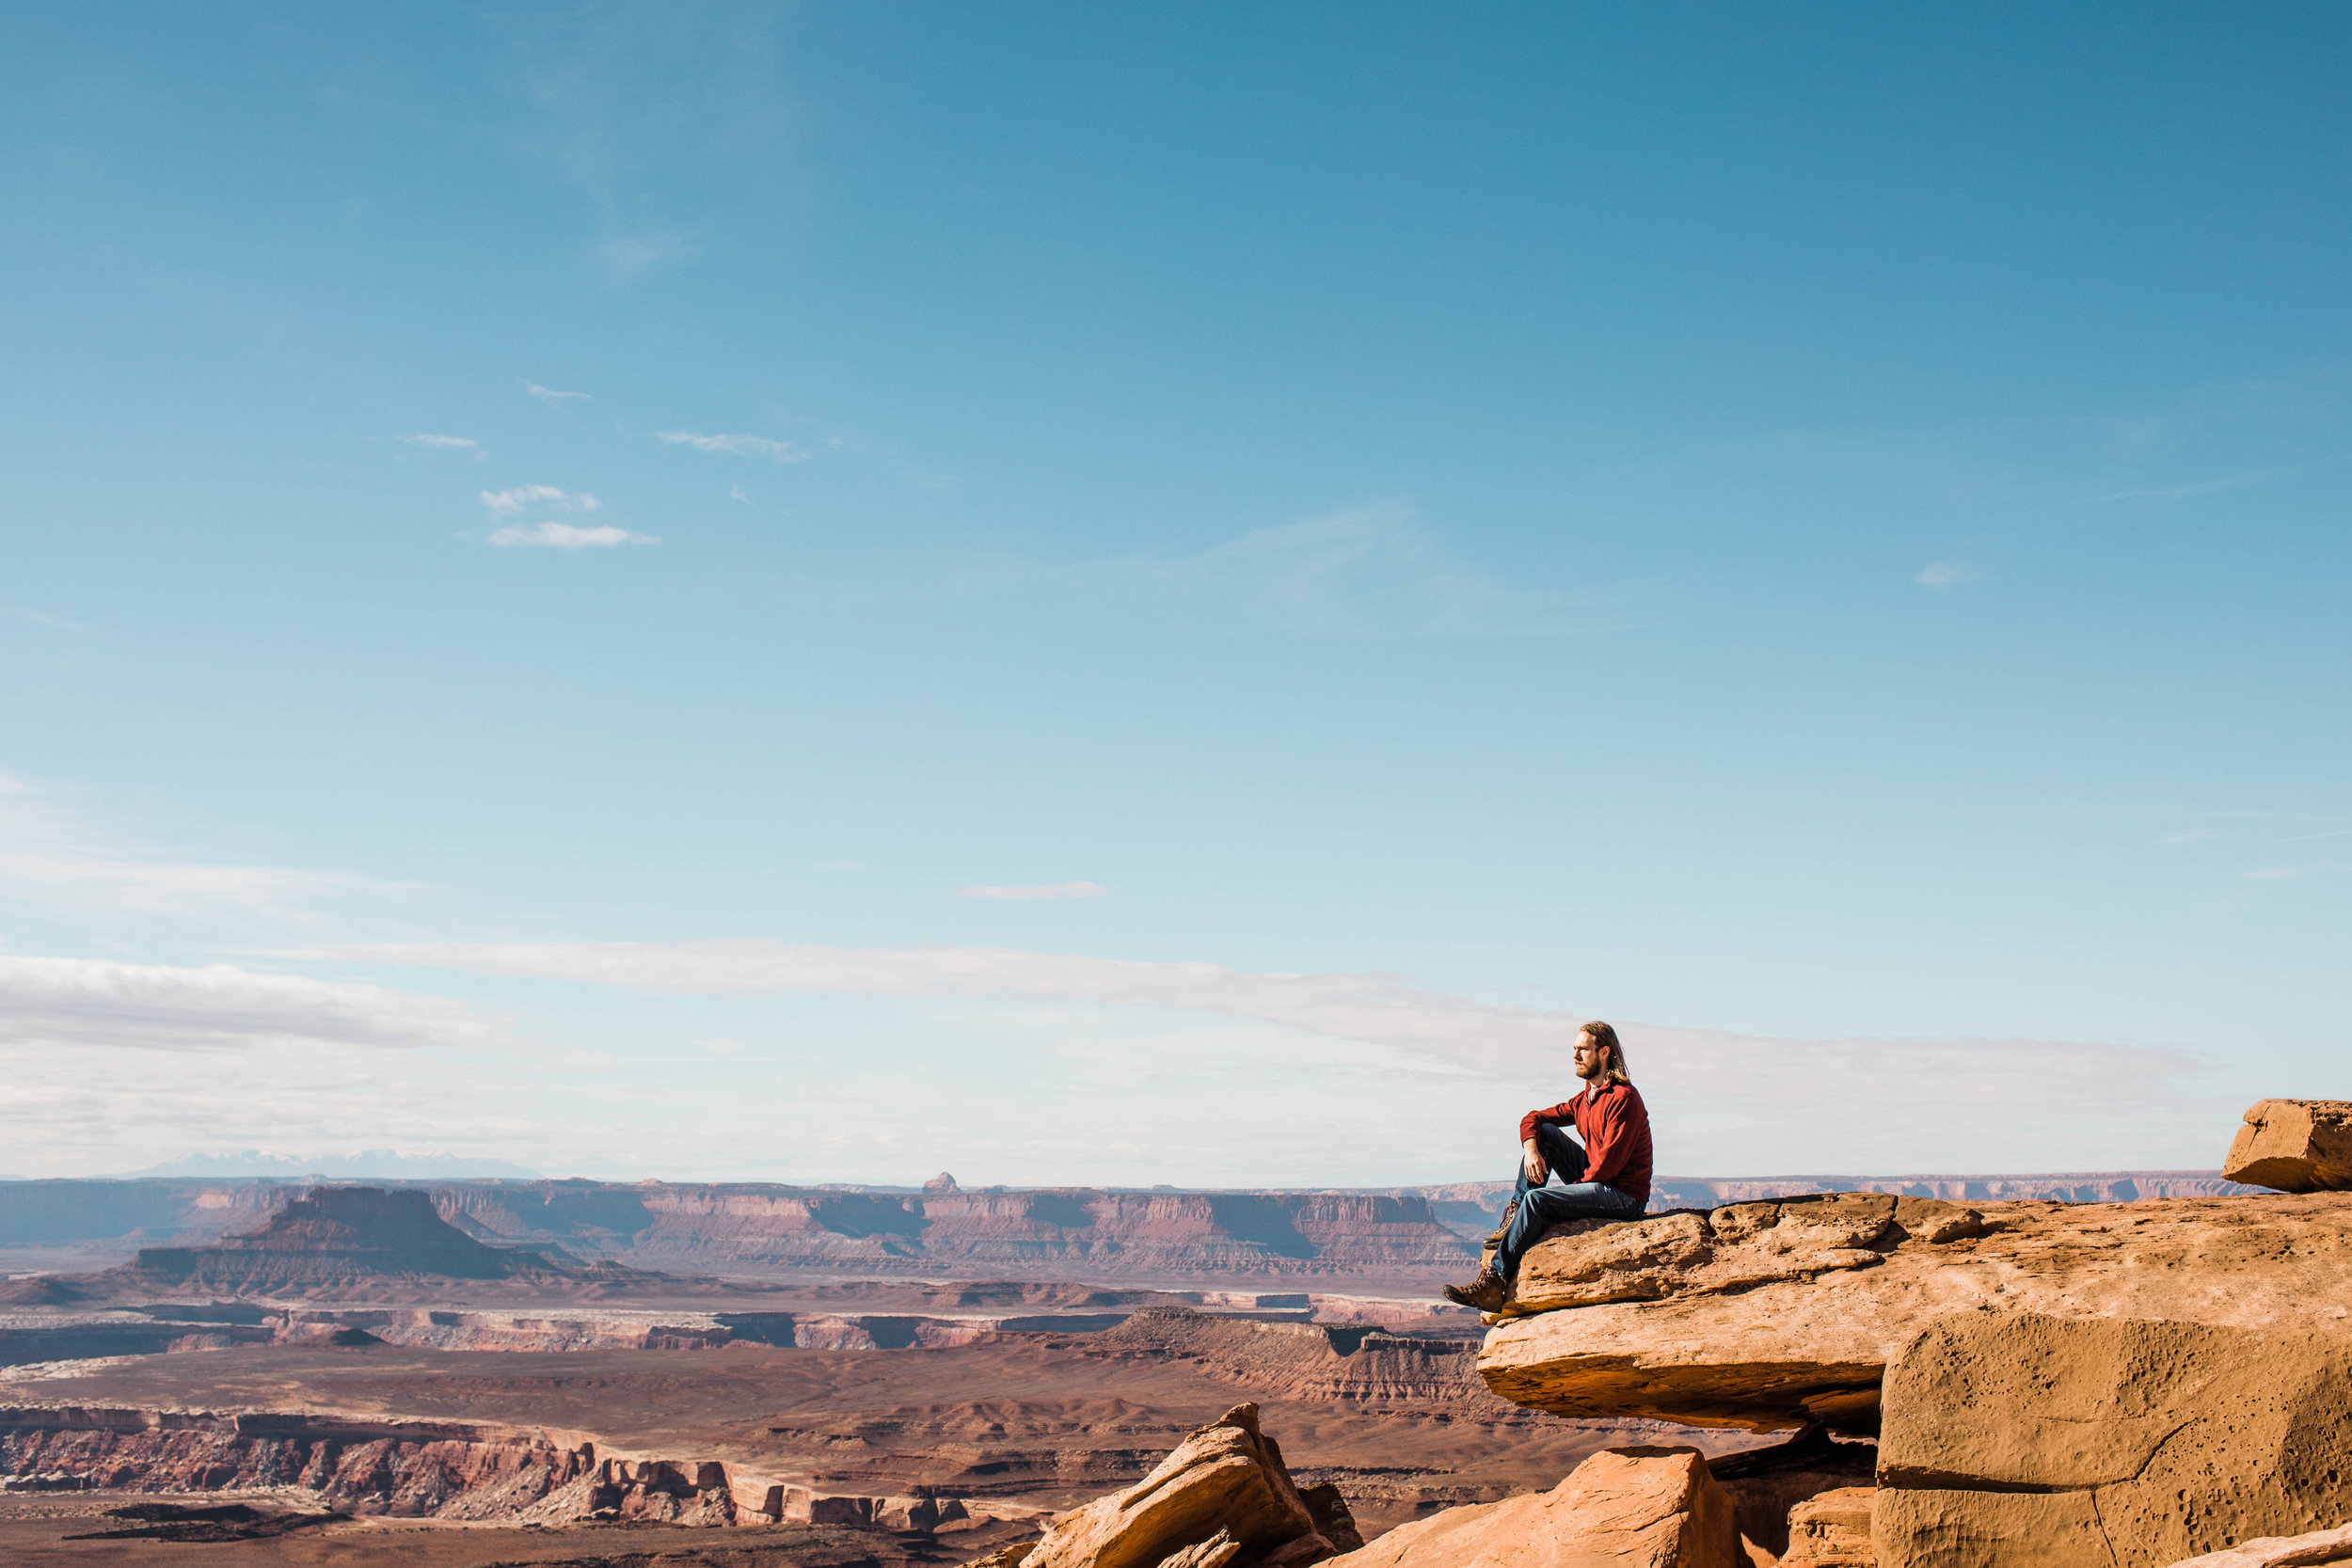 Sheena_Shahangian_Photography_Black_Canyon_Colorado_Moab_Utah_Adventure_Session_Road_Trip_Sheena_Ed-25.jpg